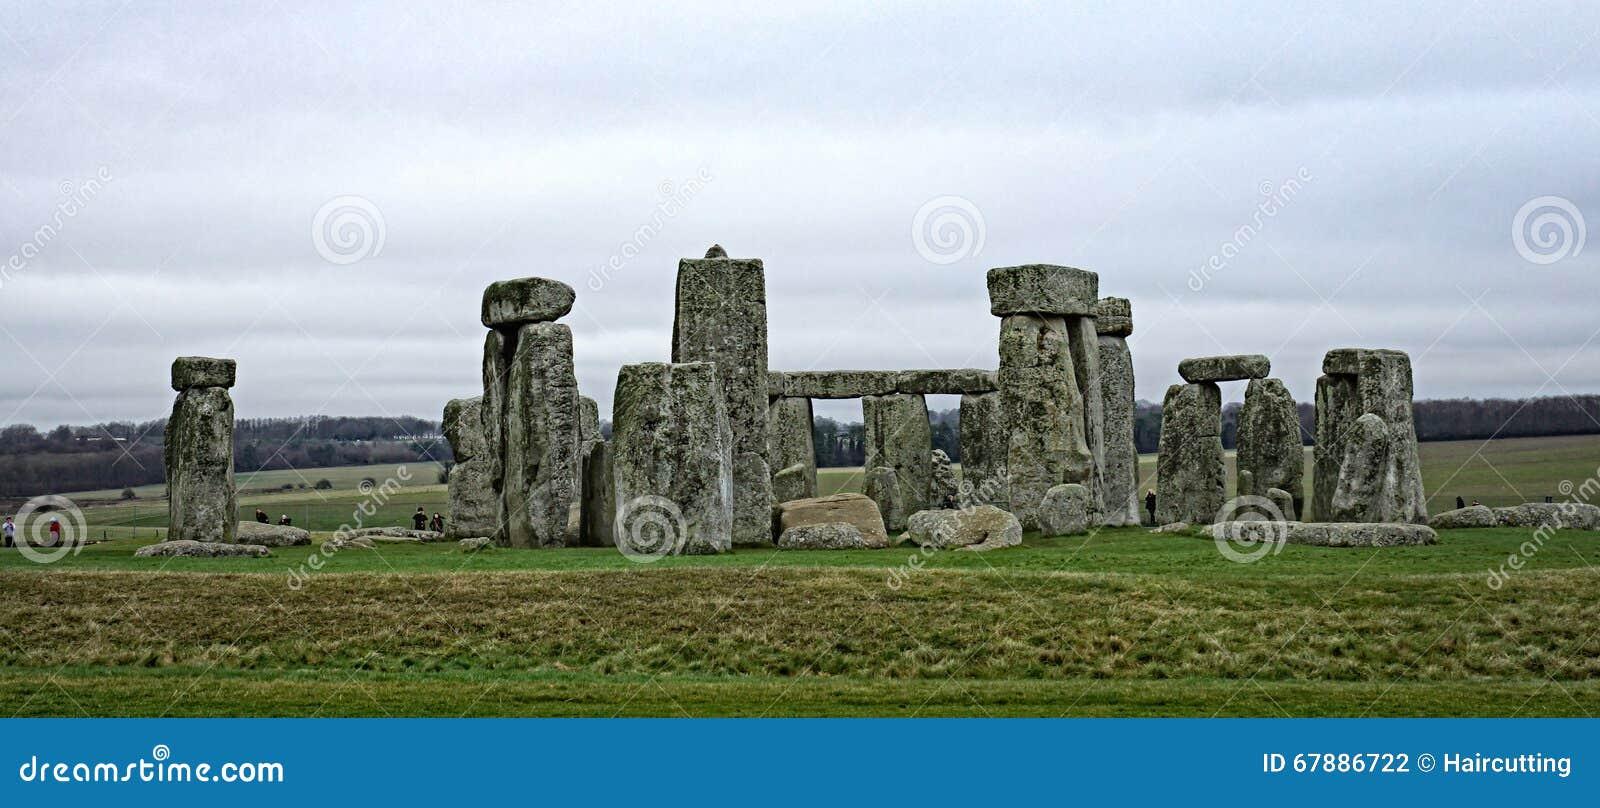 Stonehenge在萨利,威尔特郡,英国附近的一座古老史前石纪念碑